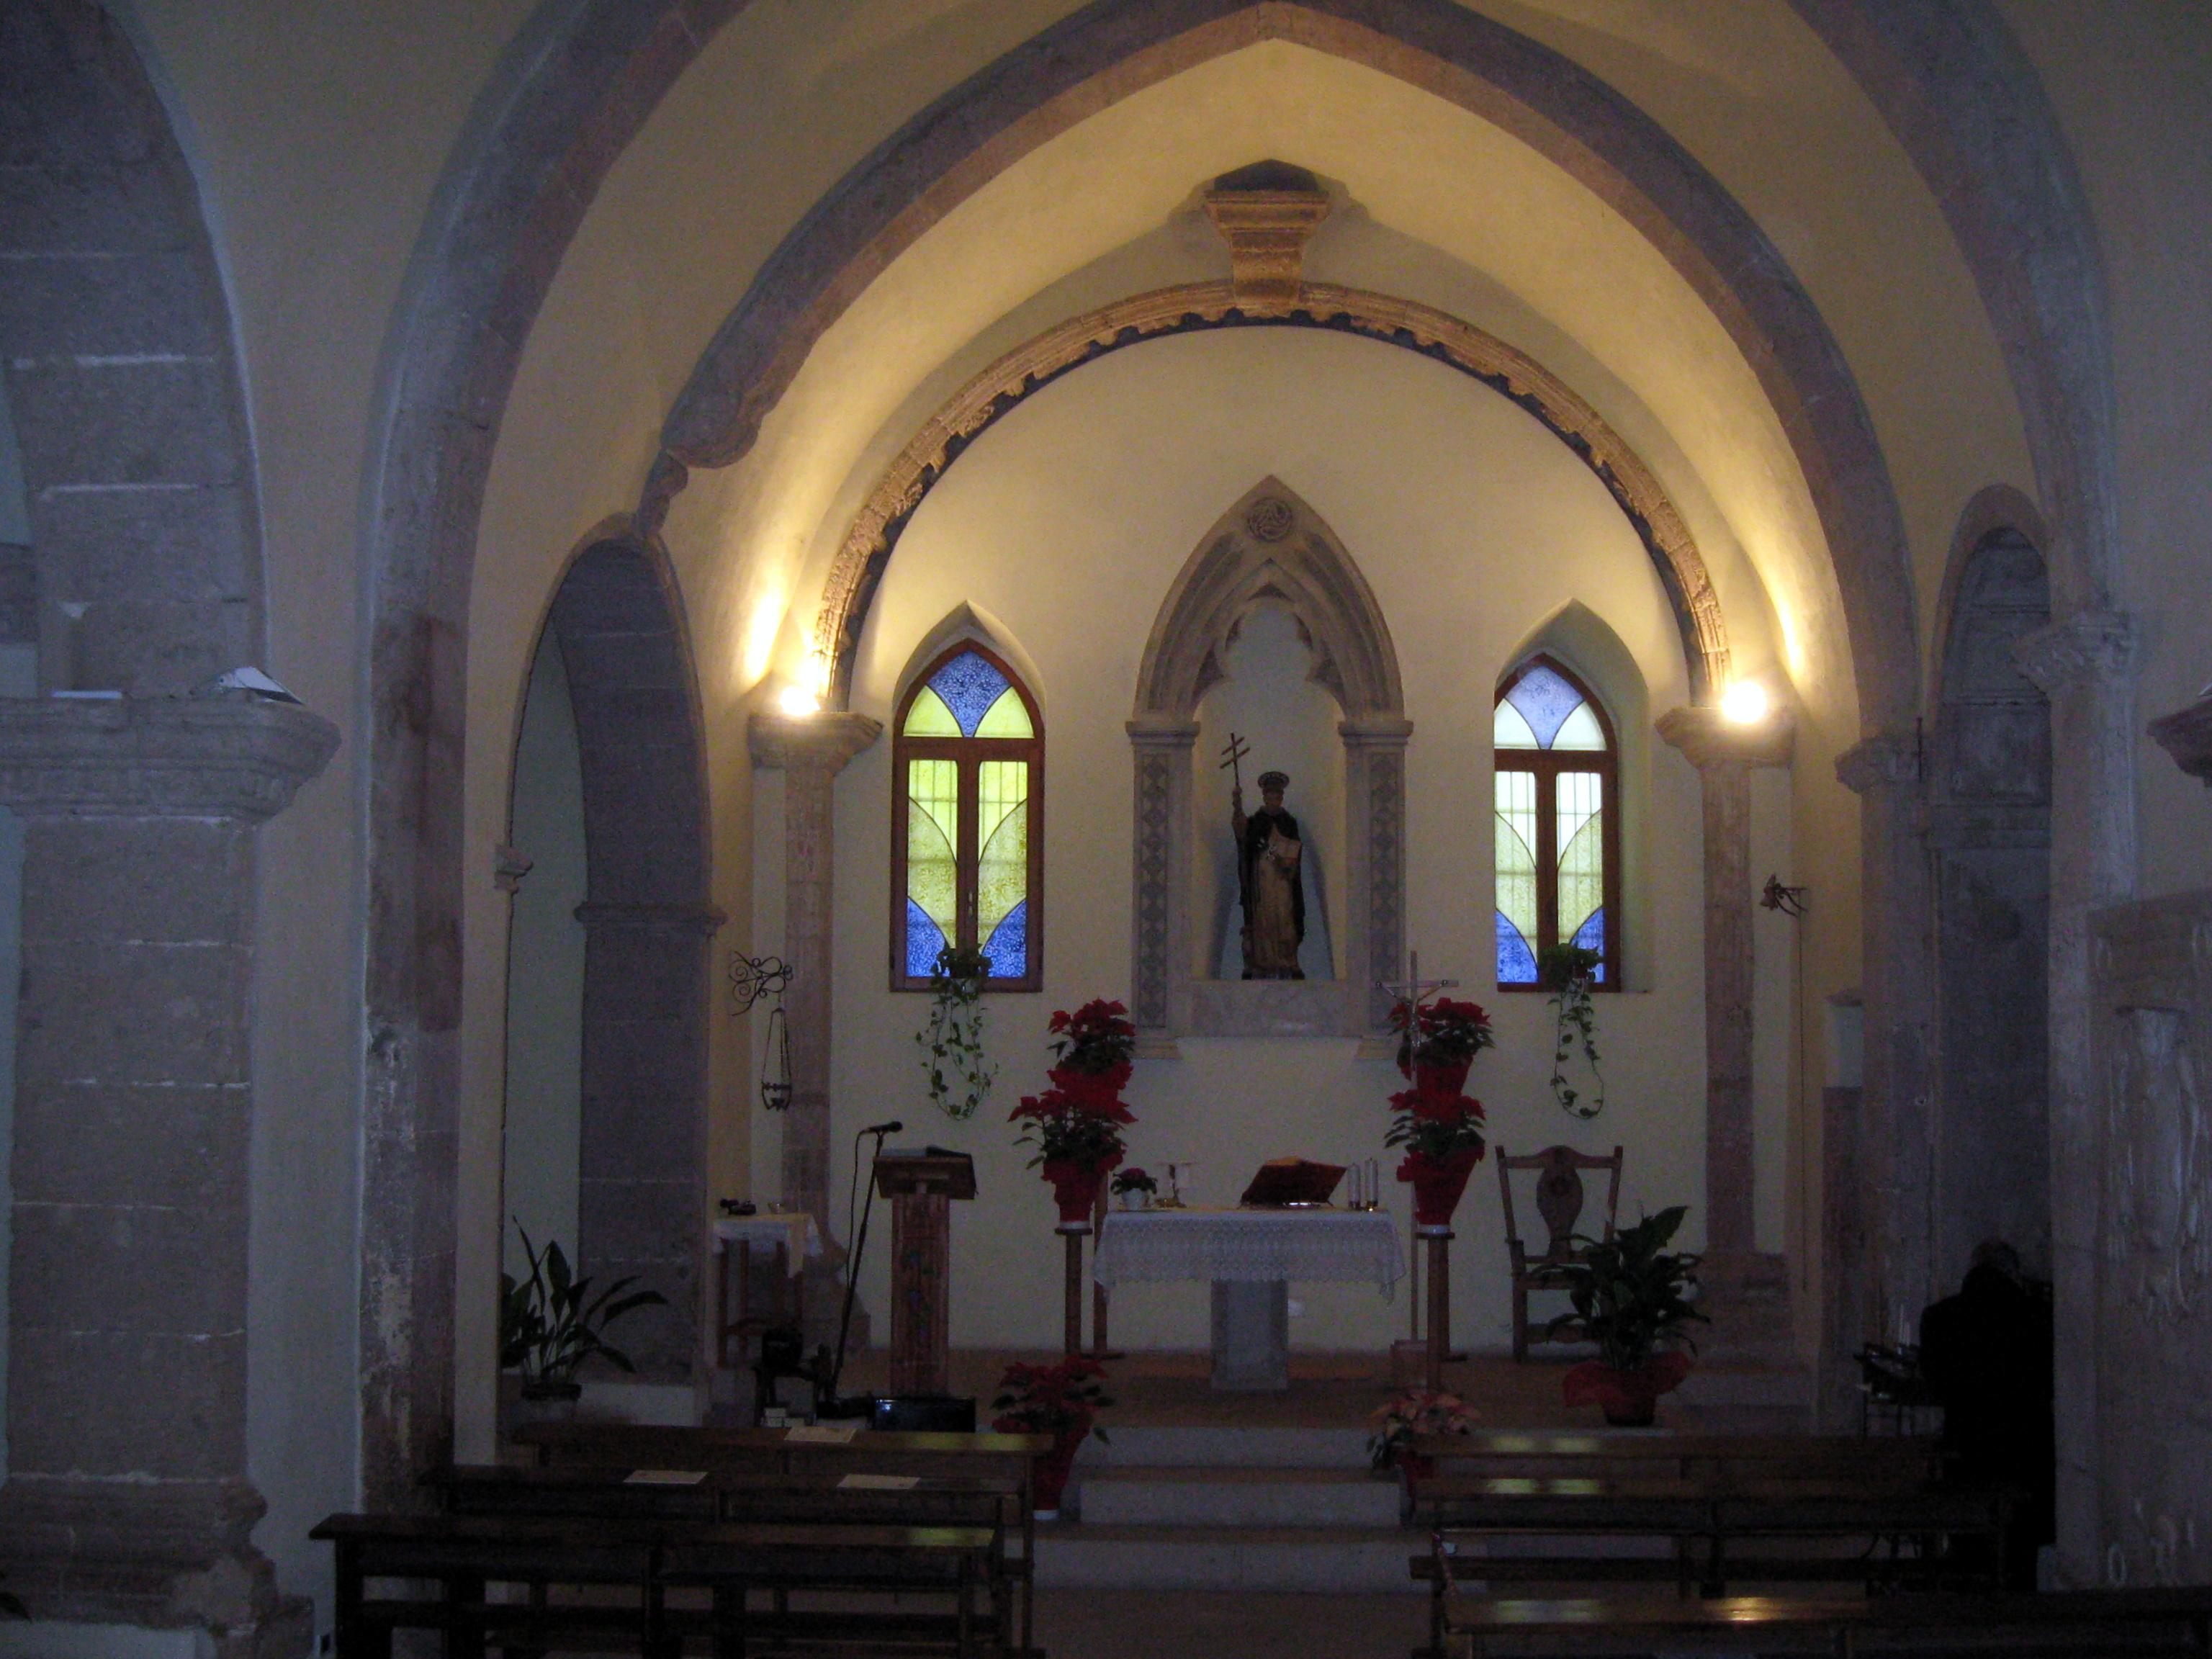 Interior of The Church of San Domenico